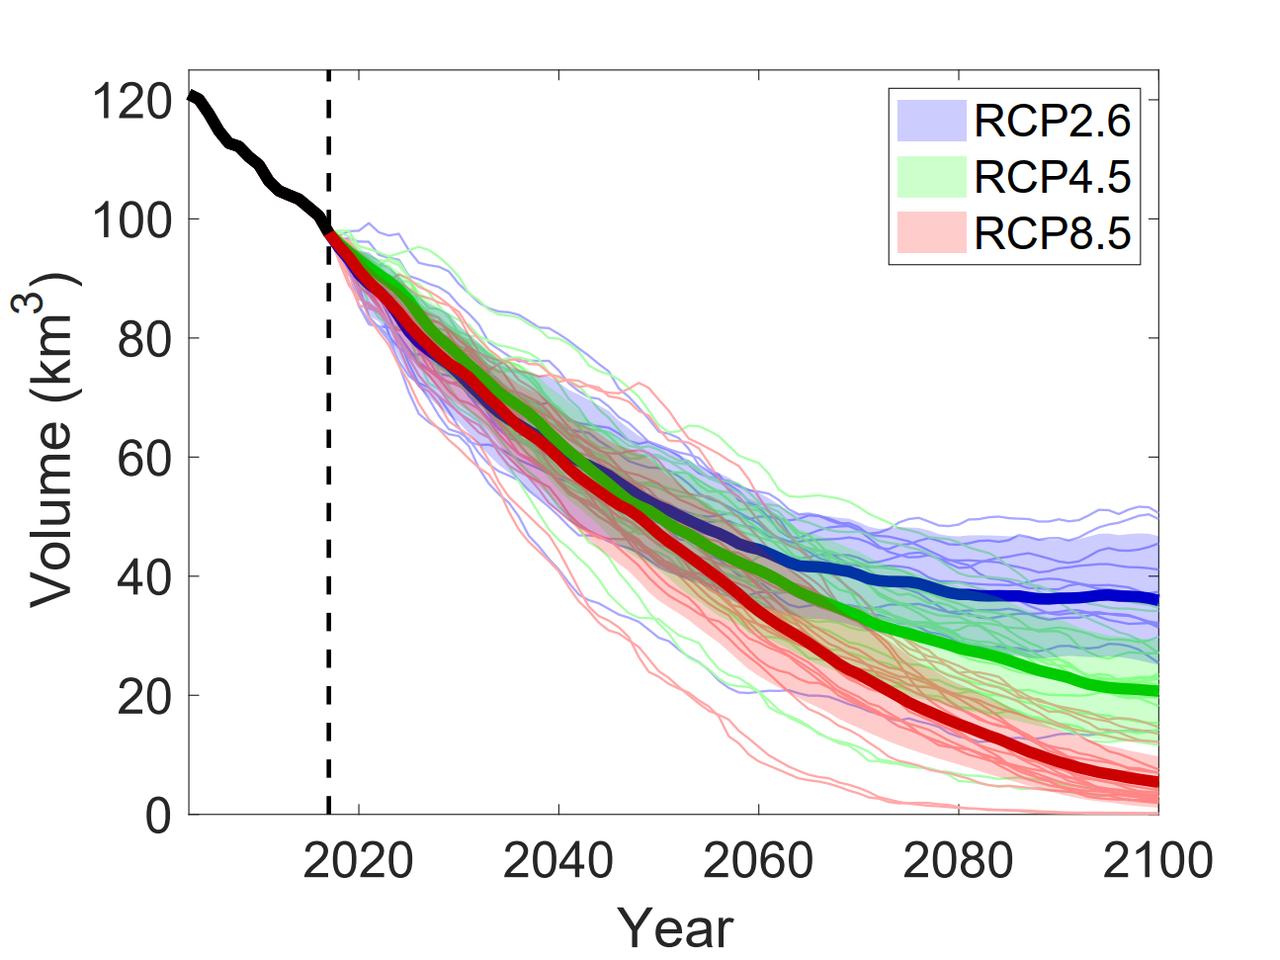 Evolution of total glacier volume in the European Alps between 2003 and 2100 (Credit: Zekollari et al., 2019, The Cryosphere)